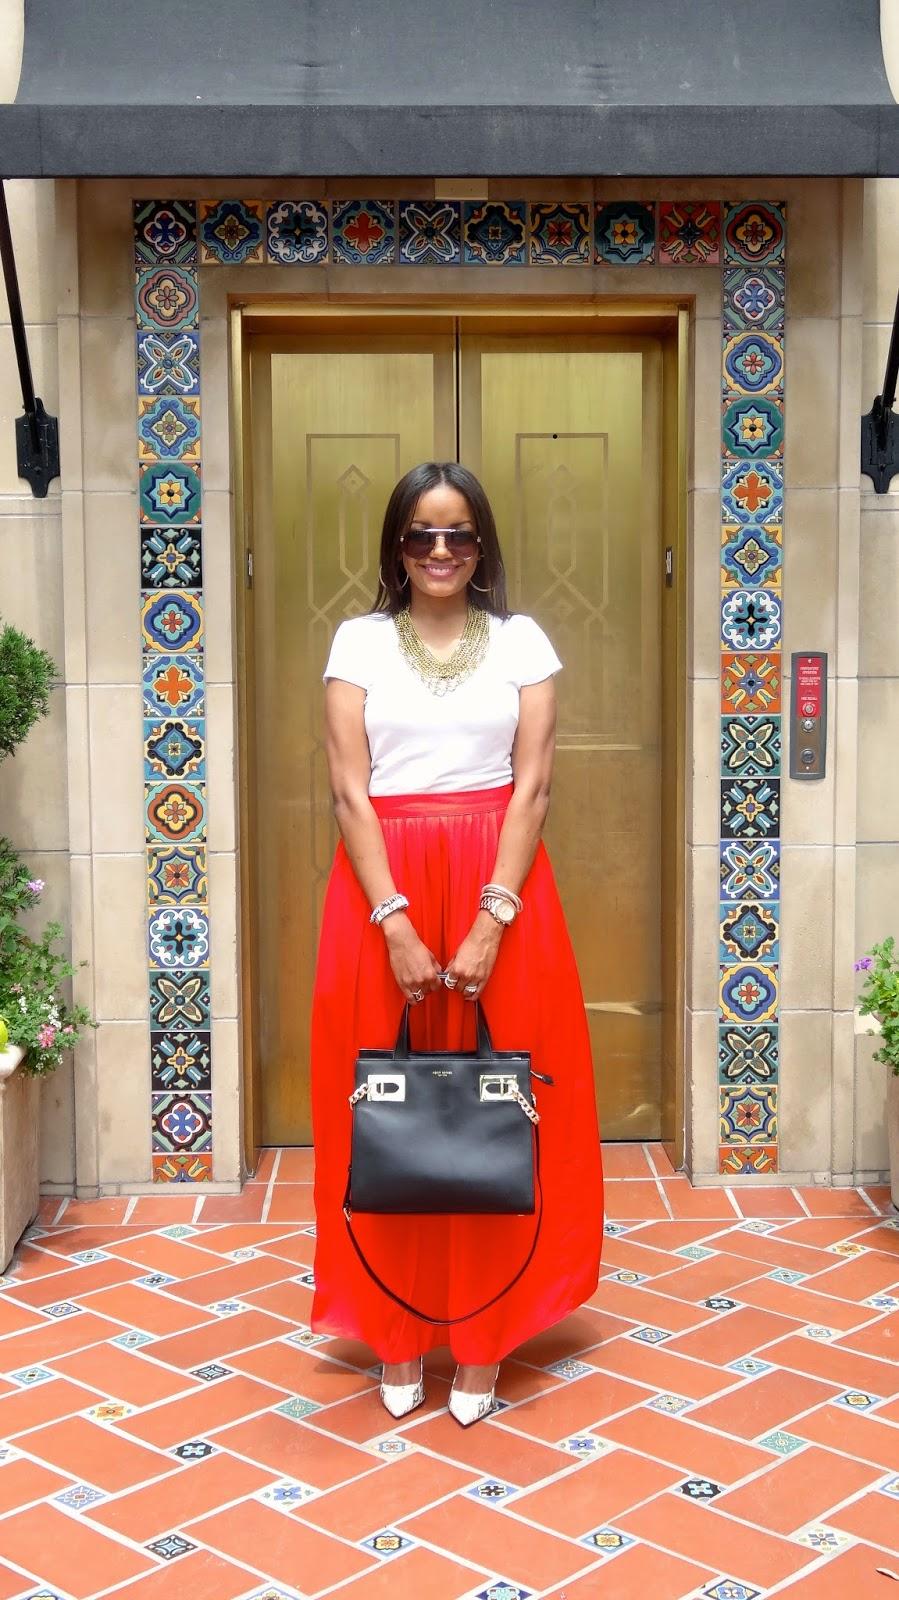 dallas fashion blogger, fashion blogger, detroit fashion blogger, maxi skirt, spring fashion, snakeskin pump, steve madden, bcbg maxi,henri bender, dallas fashion, arm party, highland park,